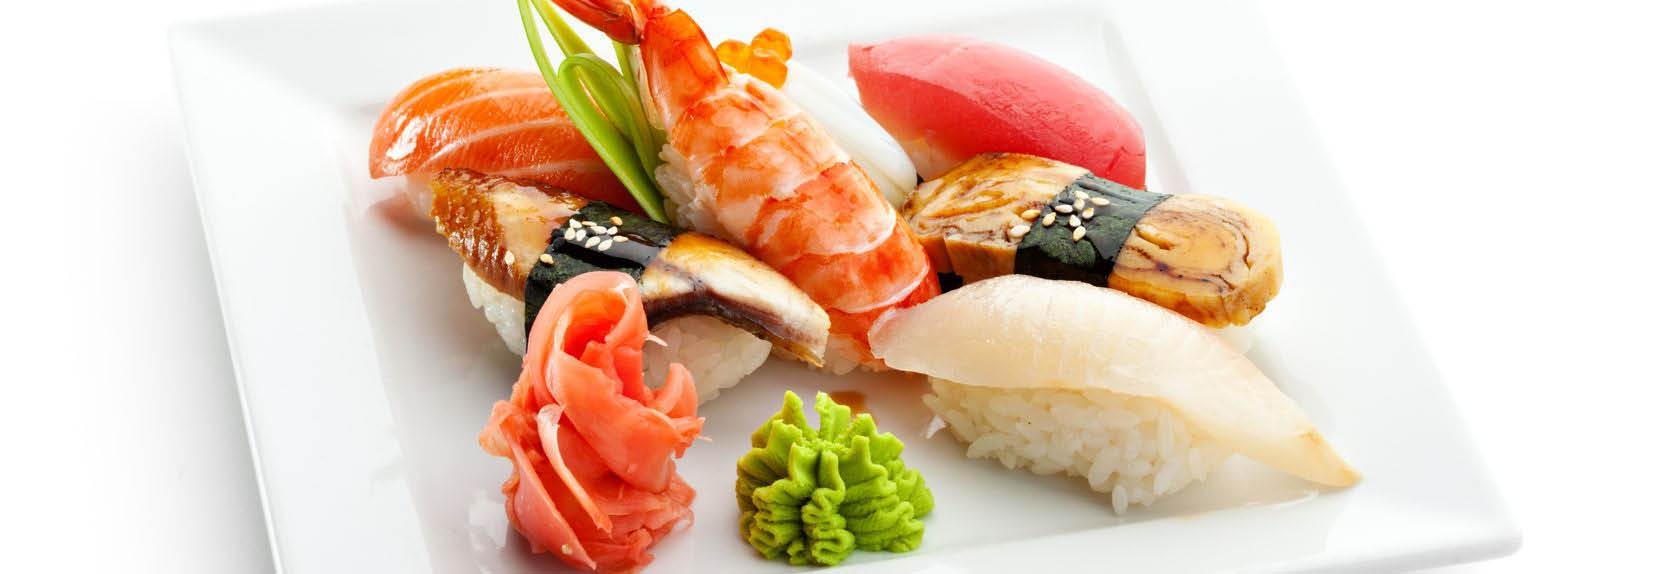 miku sushi and steakhouse photo